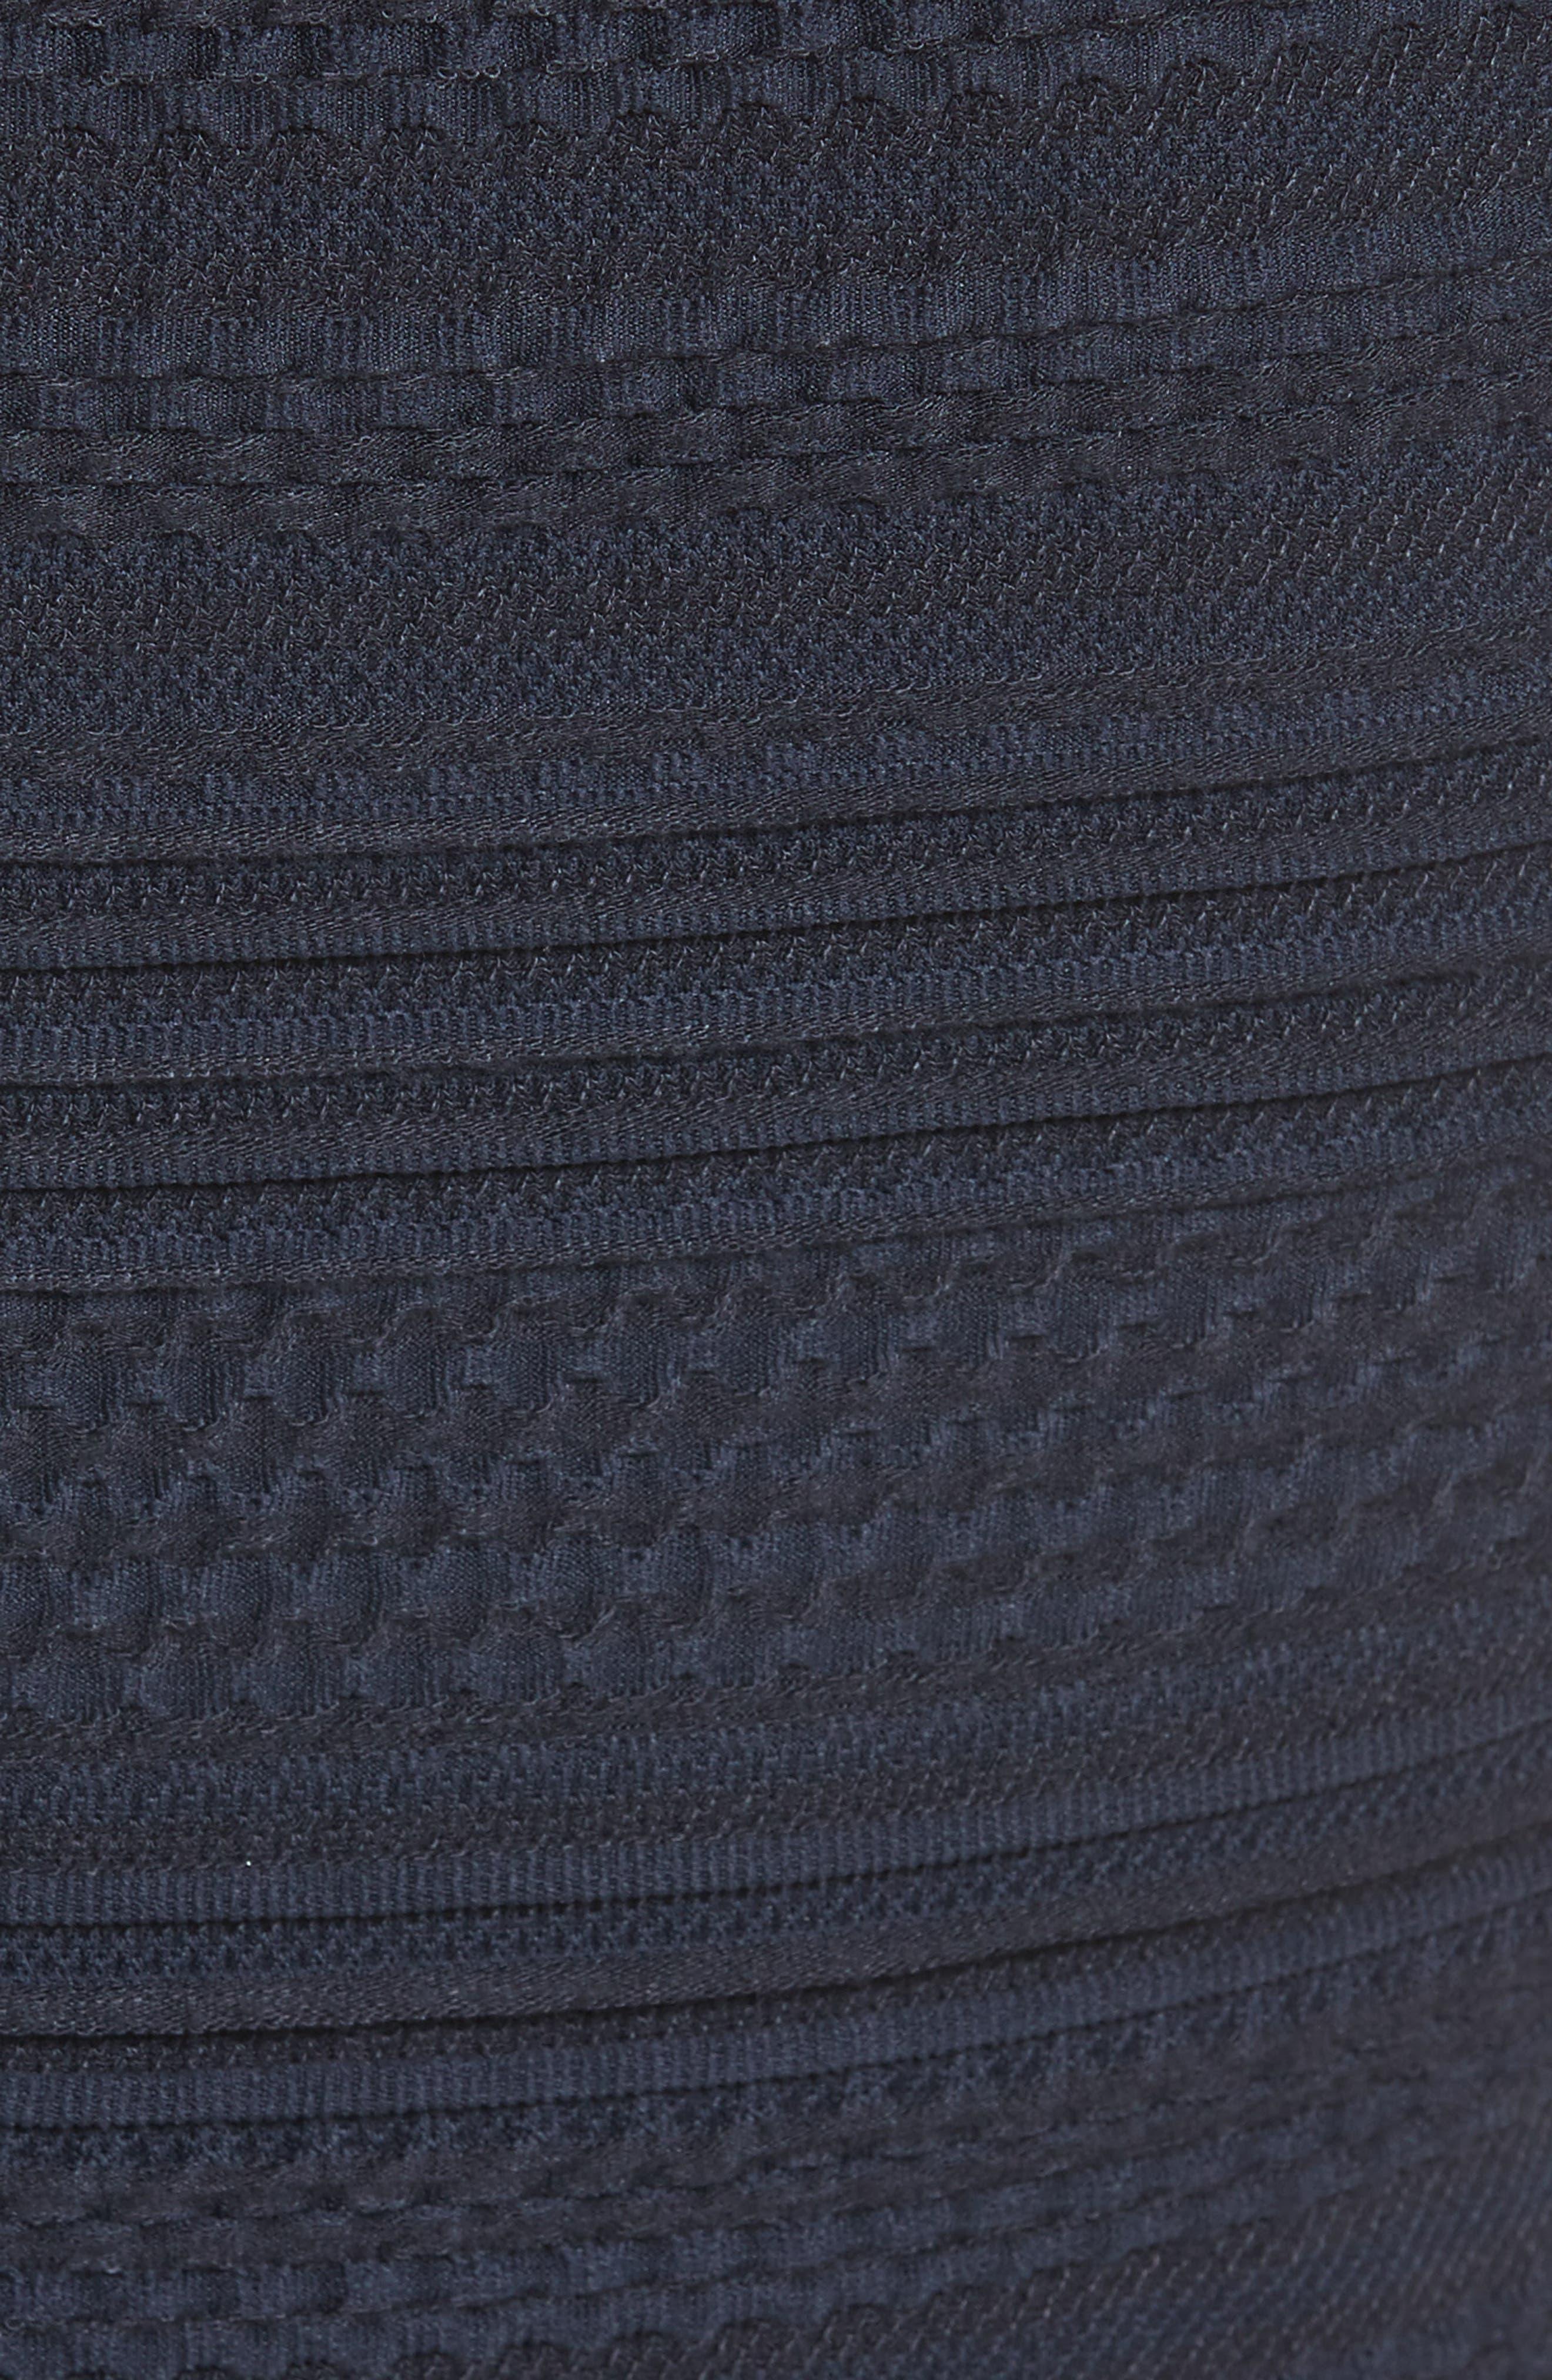 Off the Shoulder Textured Knit Dress,                             Alternate thumbnail 5, color,                             Navy